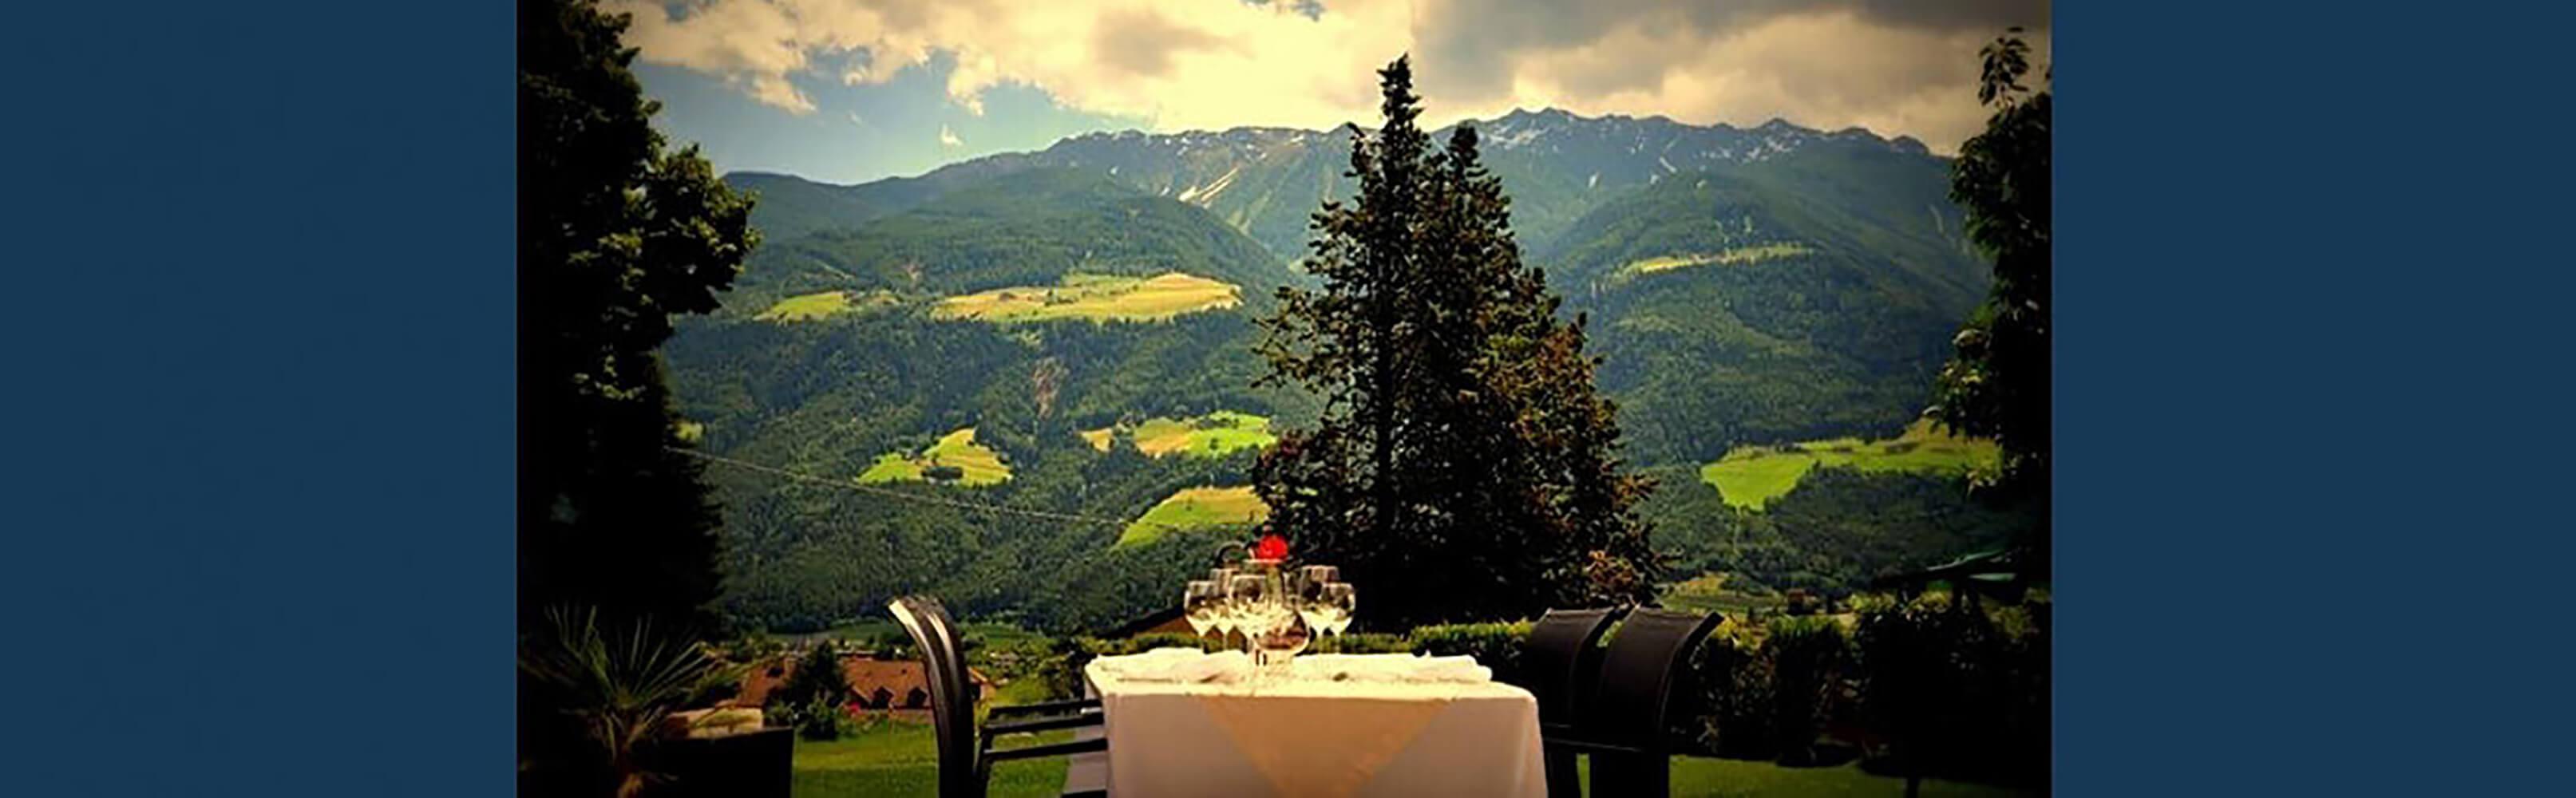 Hotel Schönblick - Naturns Südtirol 1